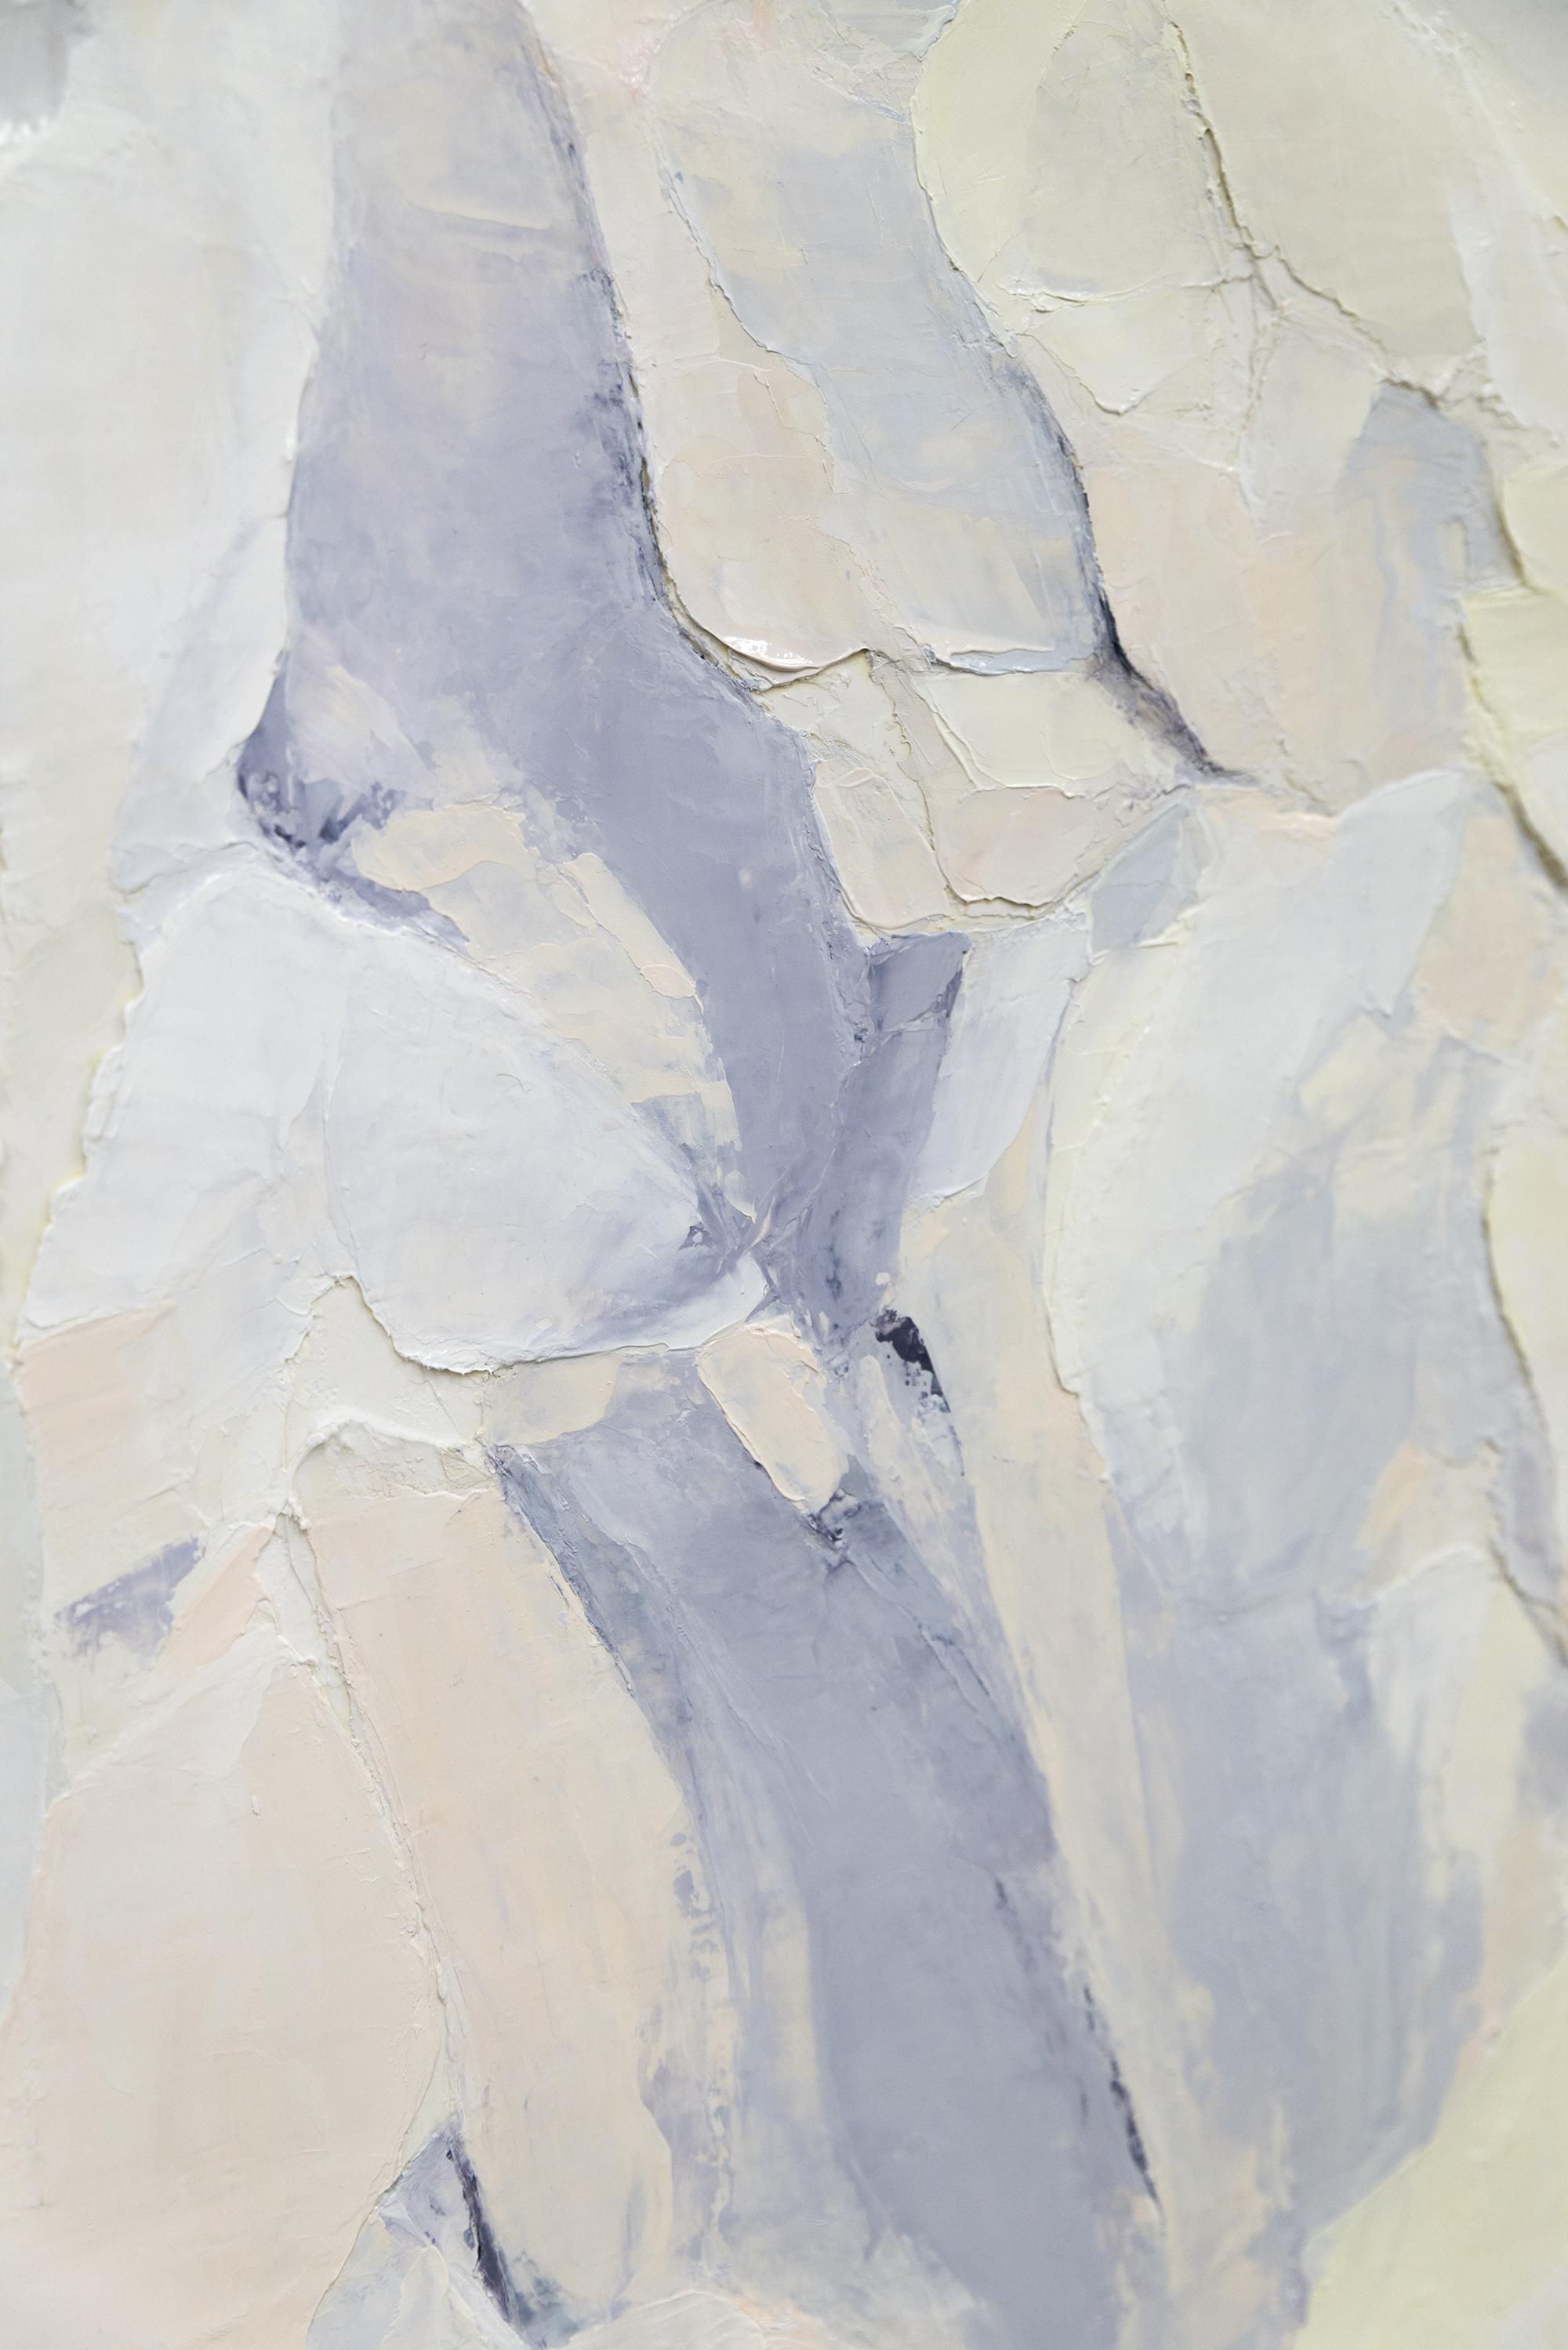 Detail. Untitled (Emerge), 2017